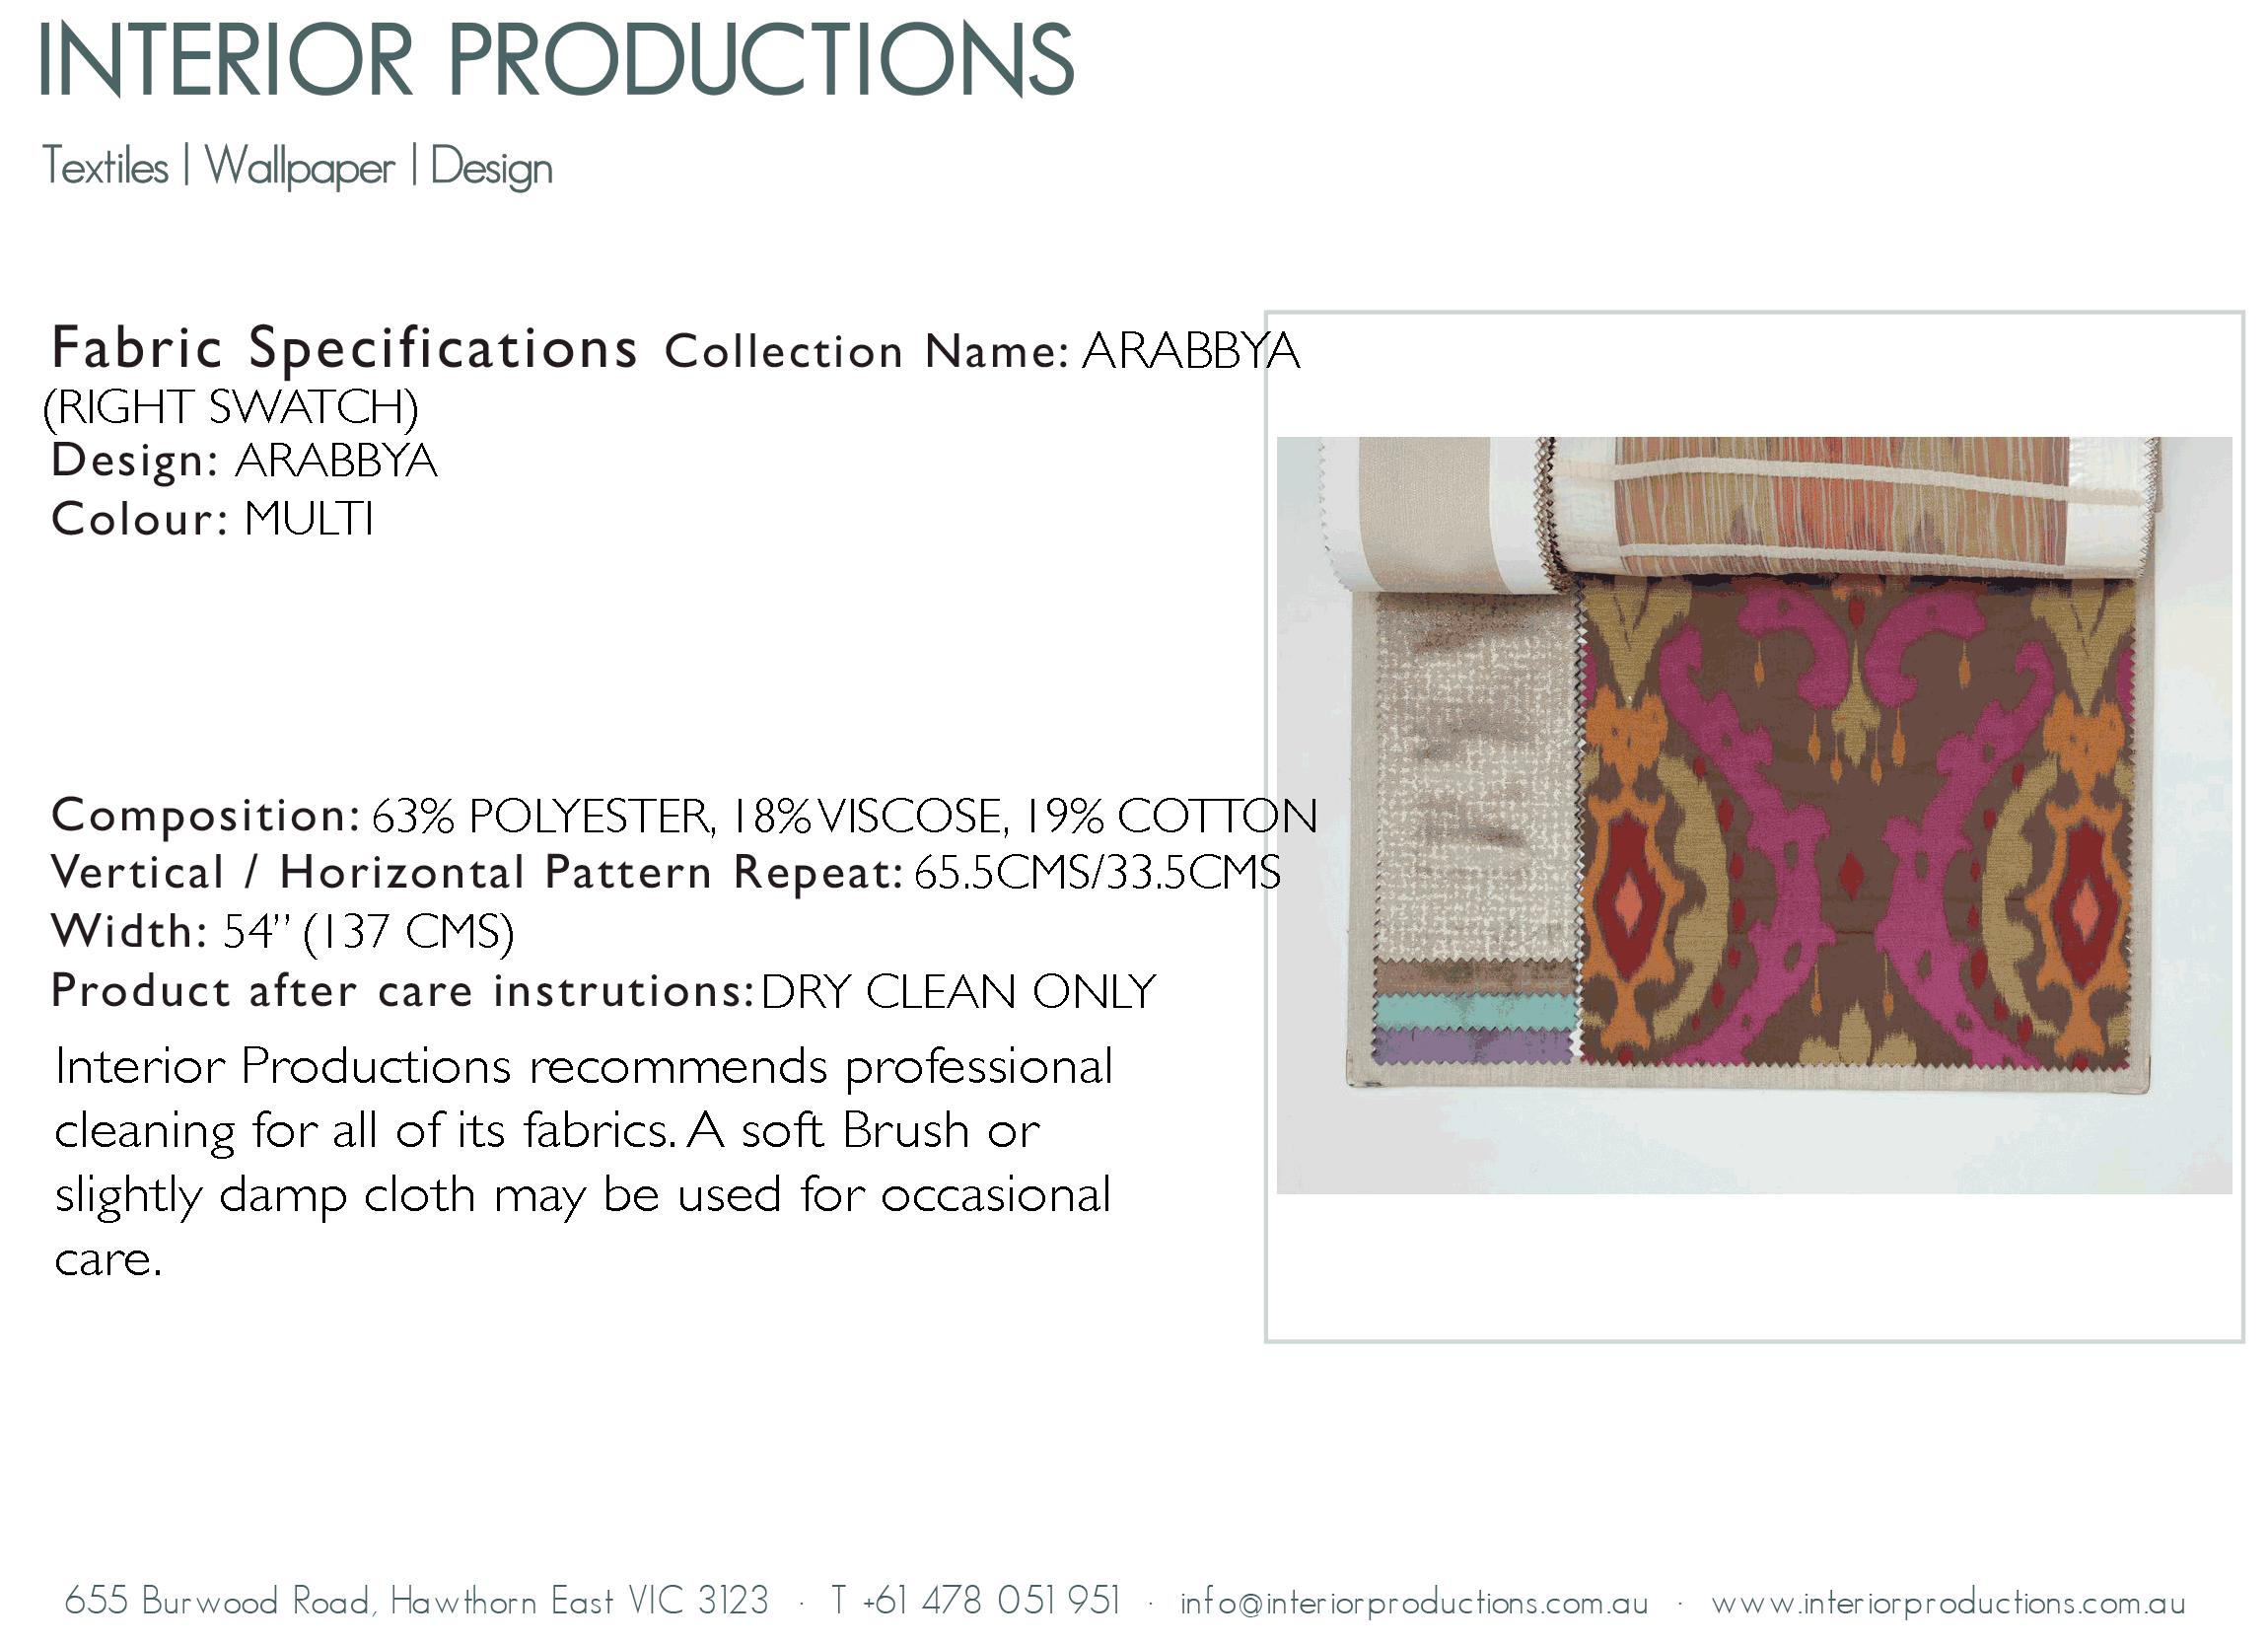 interior_productions_ARABBYA---MULTI